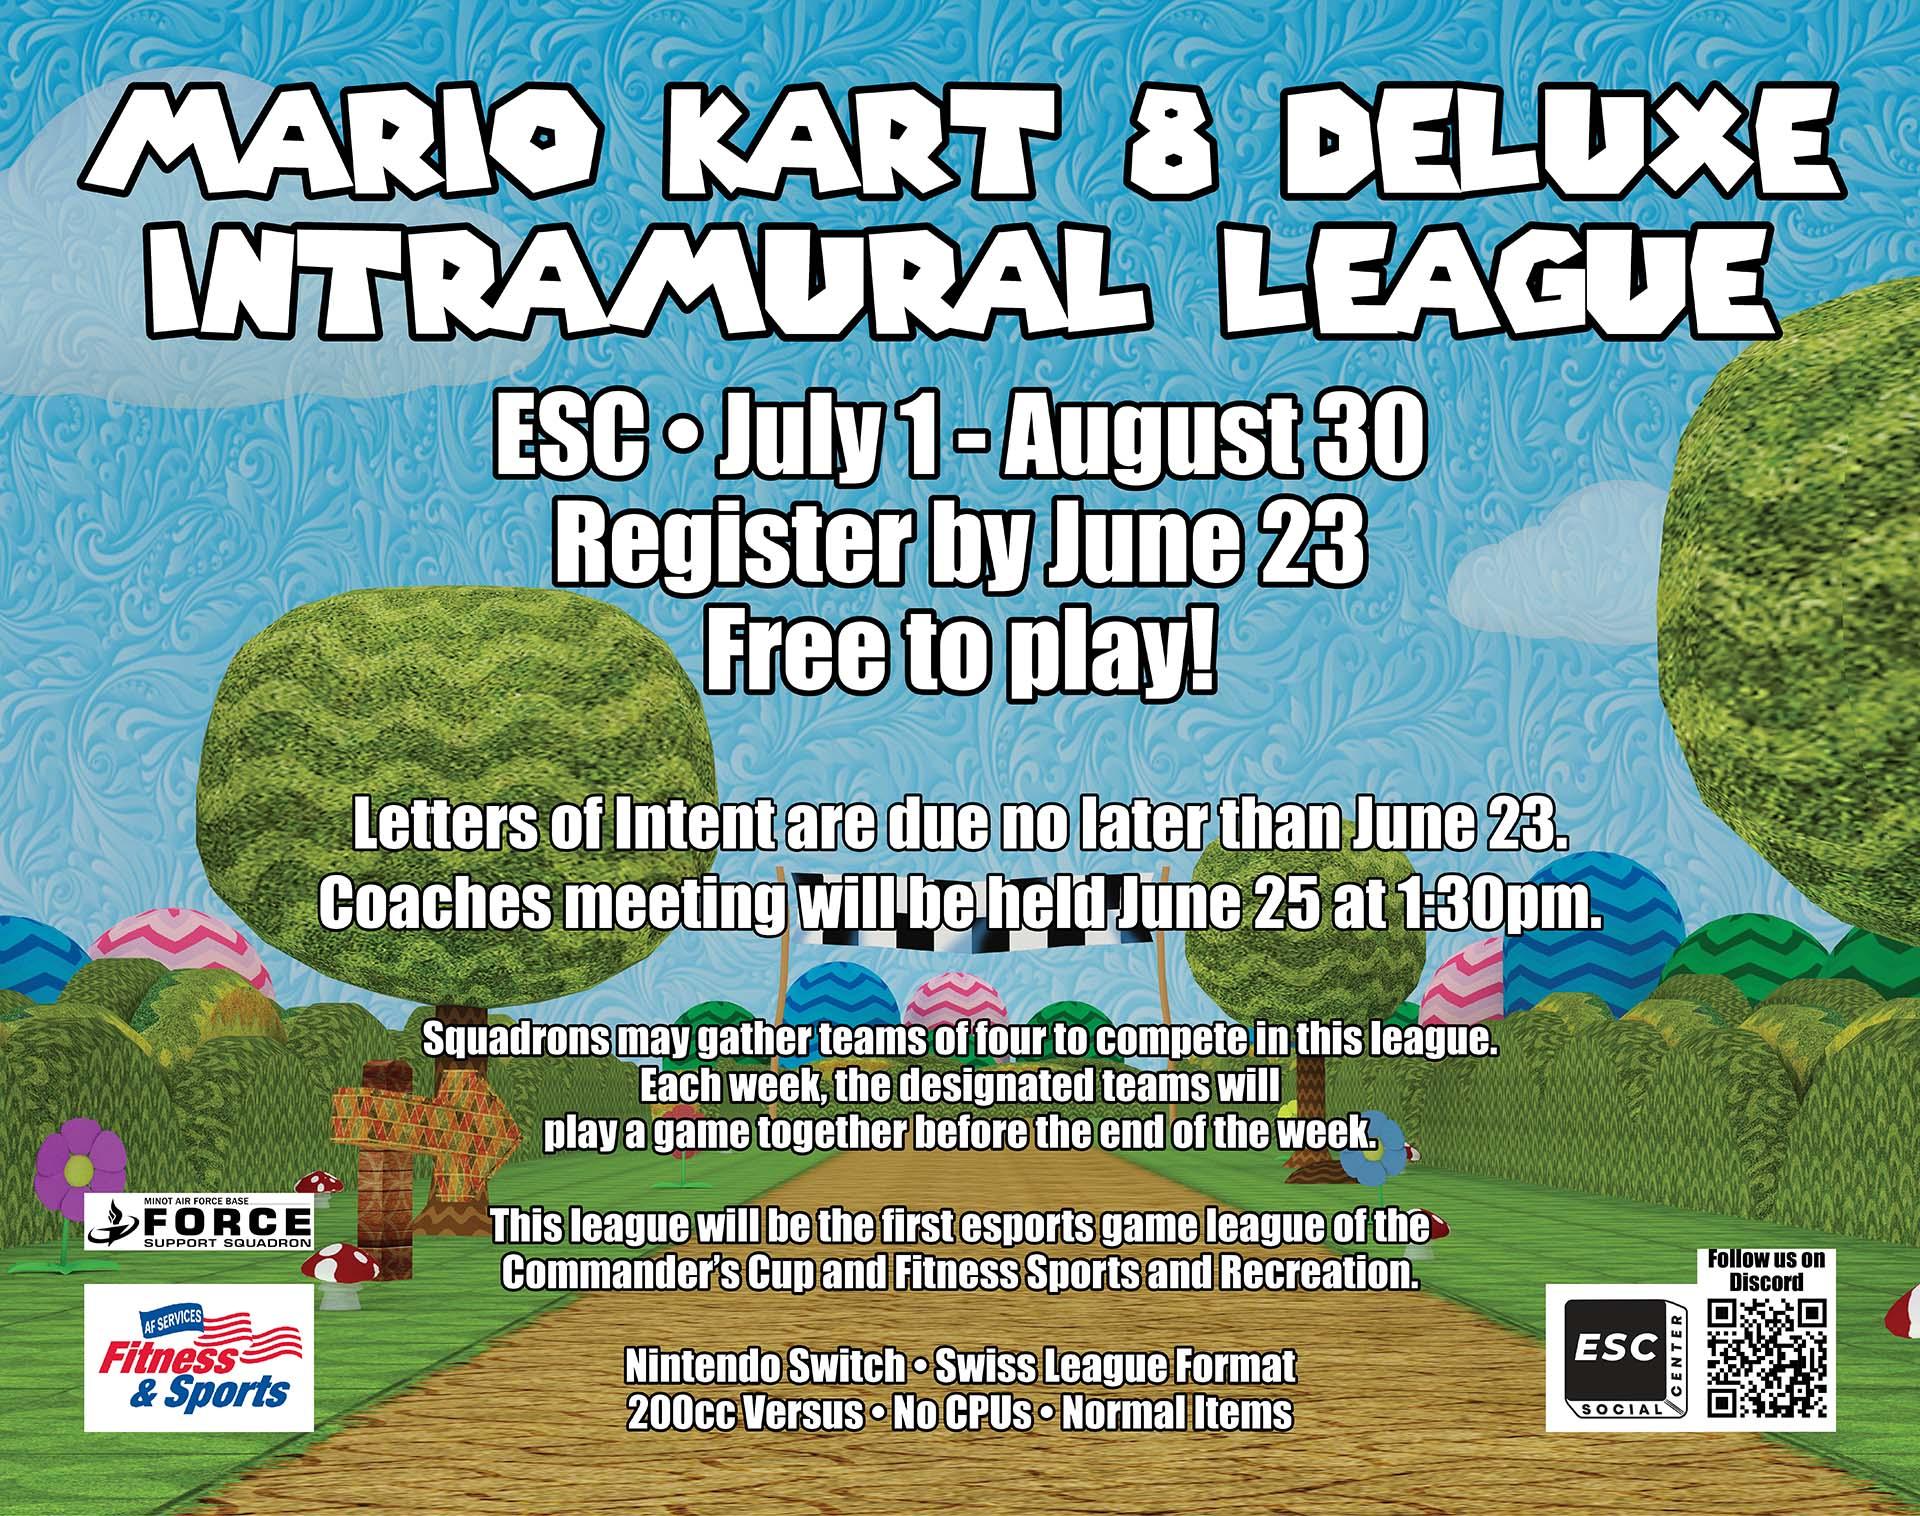 06.23 Mario Kart 8 Deluxe Intramural League - Extended